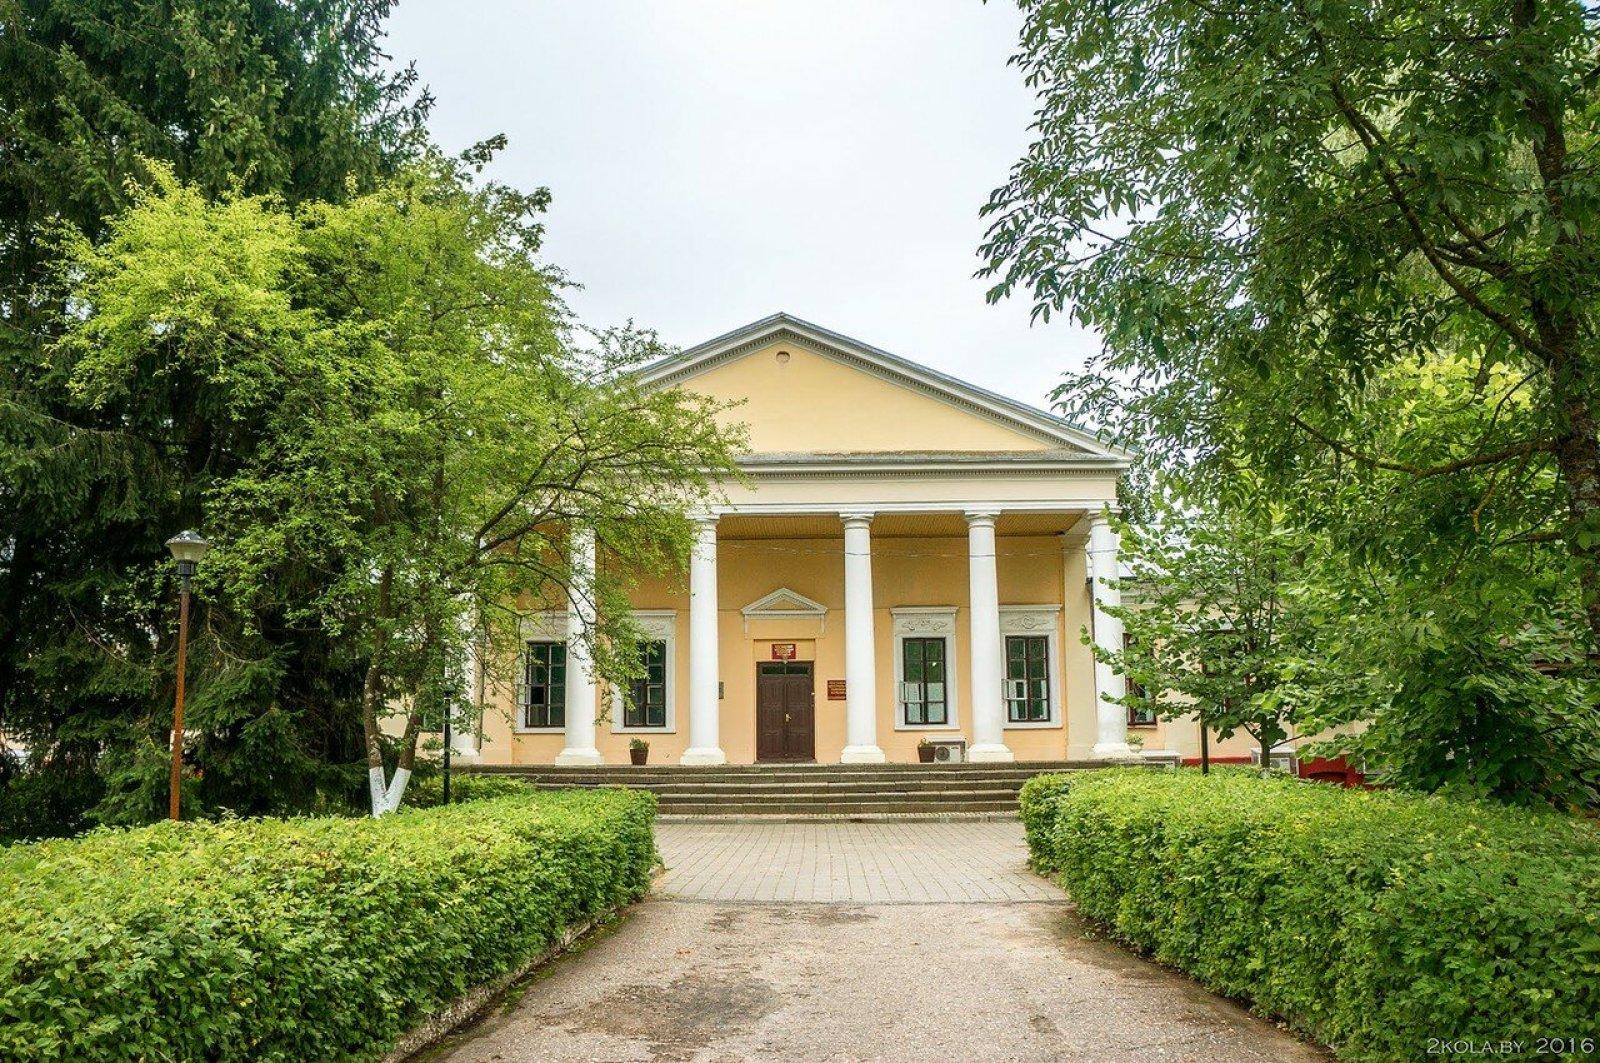 Дворец Тизенгаузера в Поставах